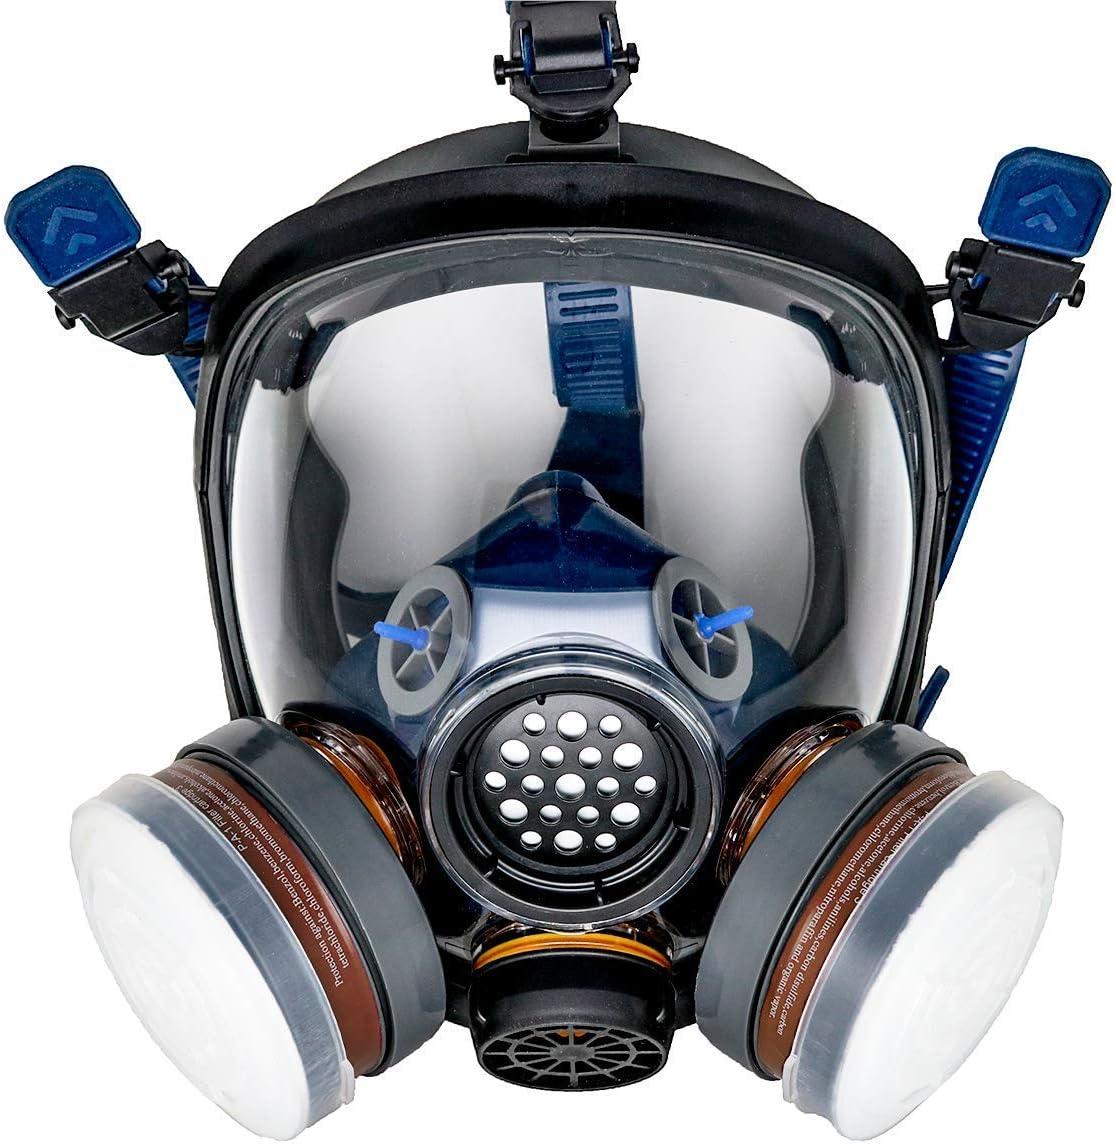 PT-100 Full Face Gas Mask & Organic Vapor Respirator